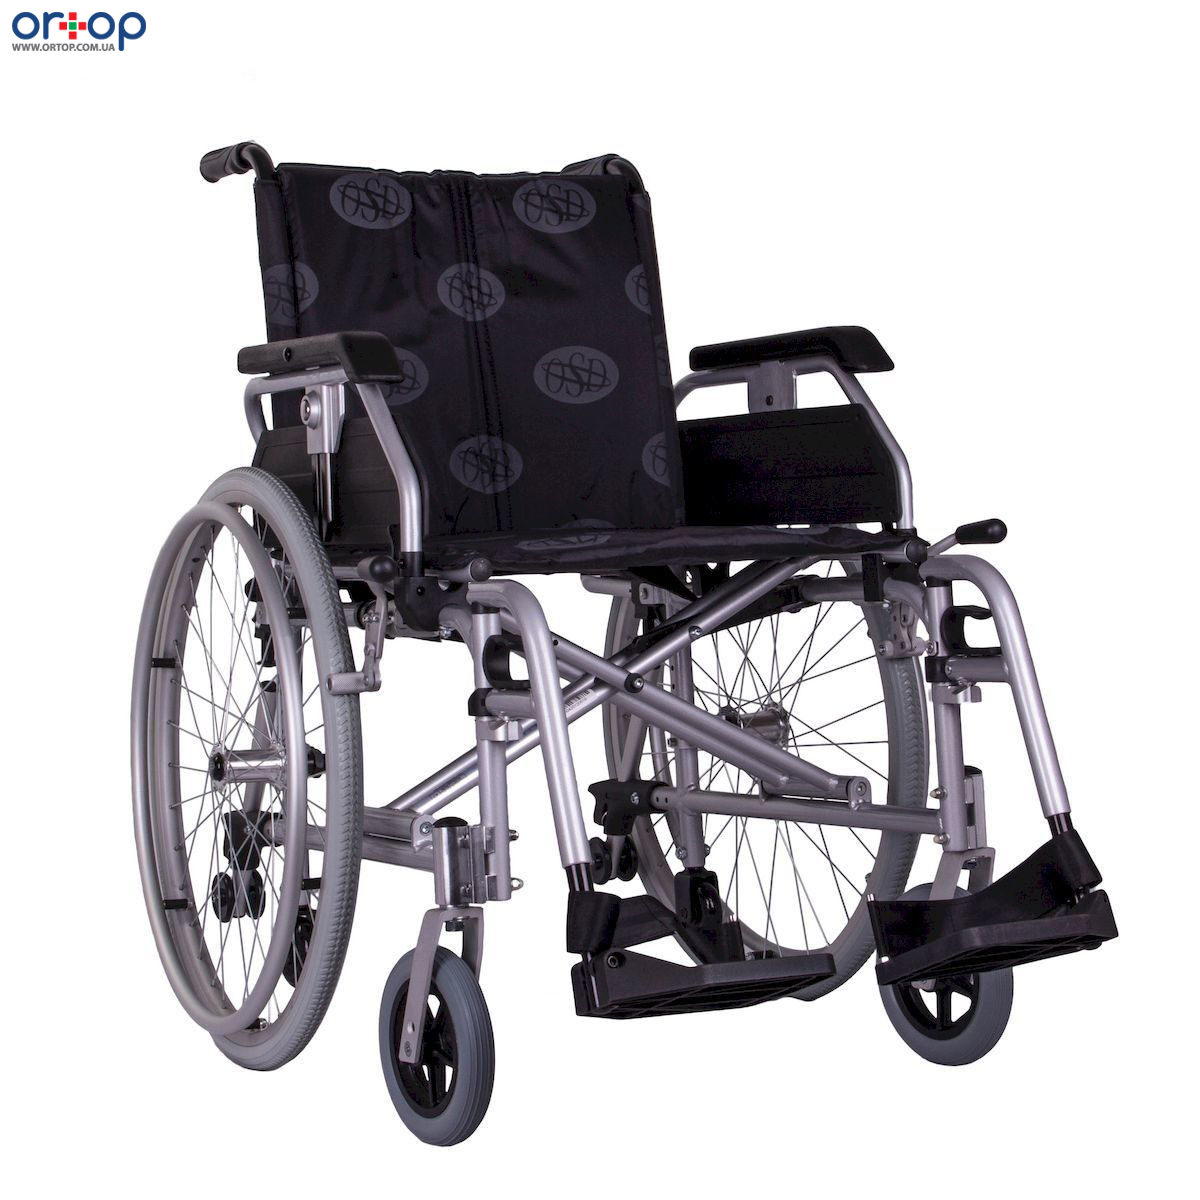 Легкая коляска LIGHT III хром, фото 1